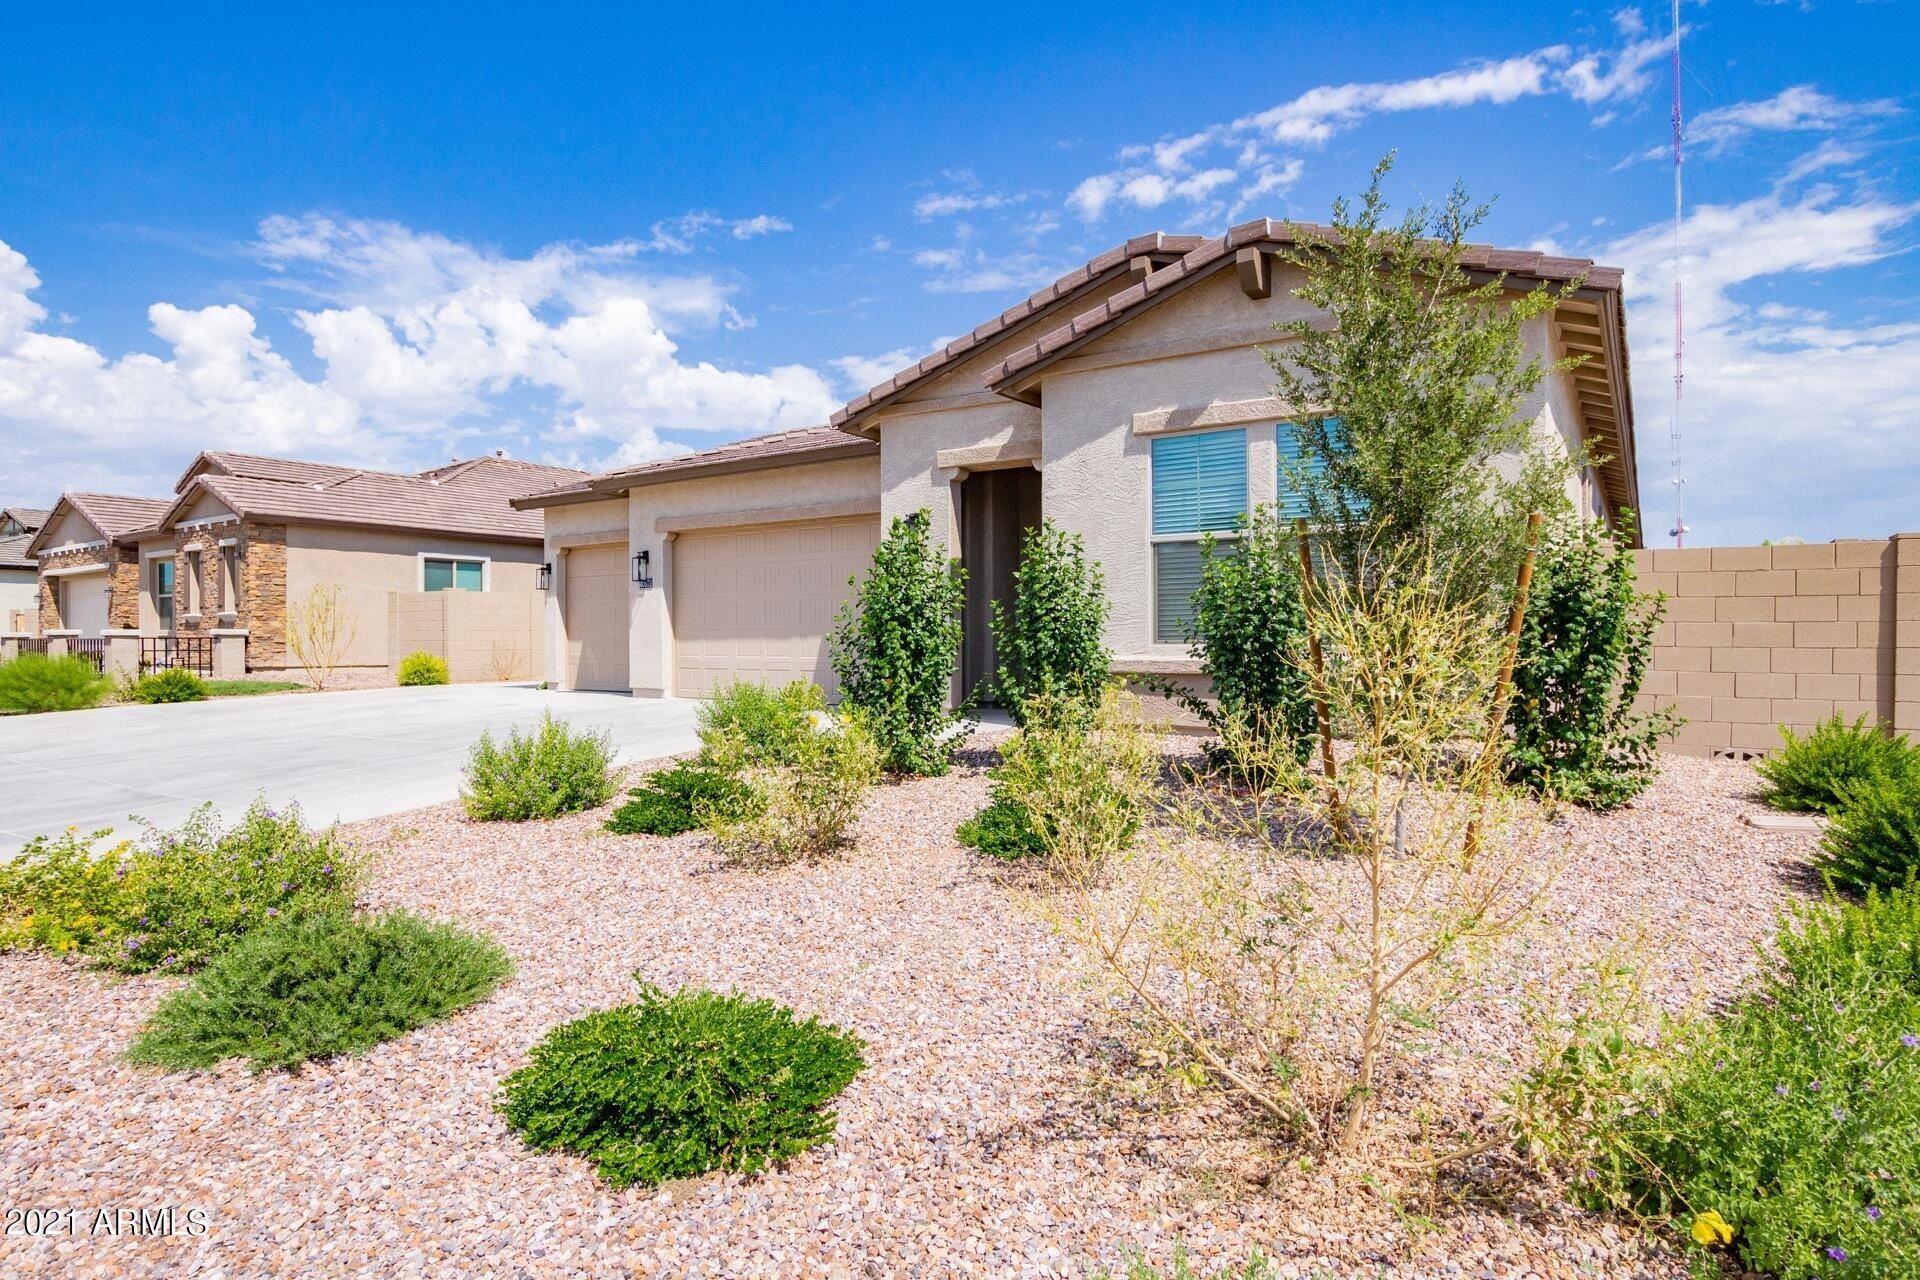 Photo of 40571 N BARRED Place, San Tan Valley, AZ 85140 (MLS # 6295826)